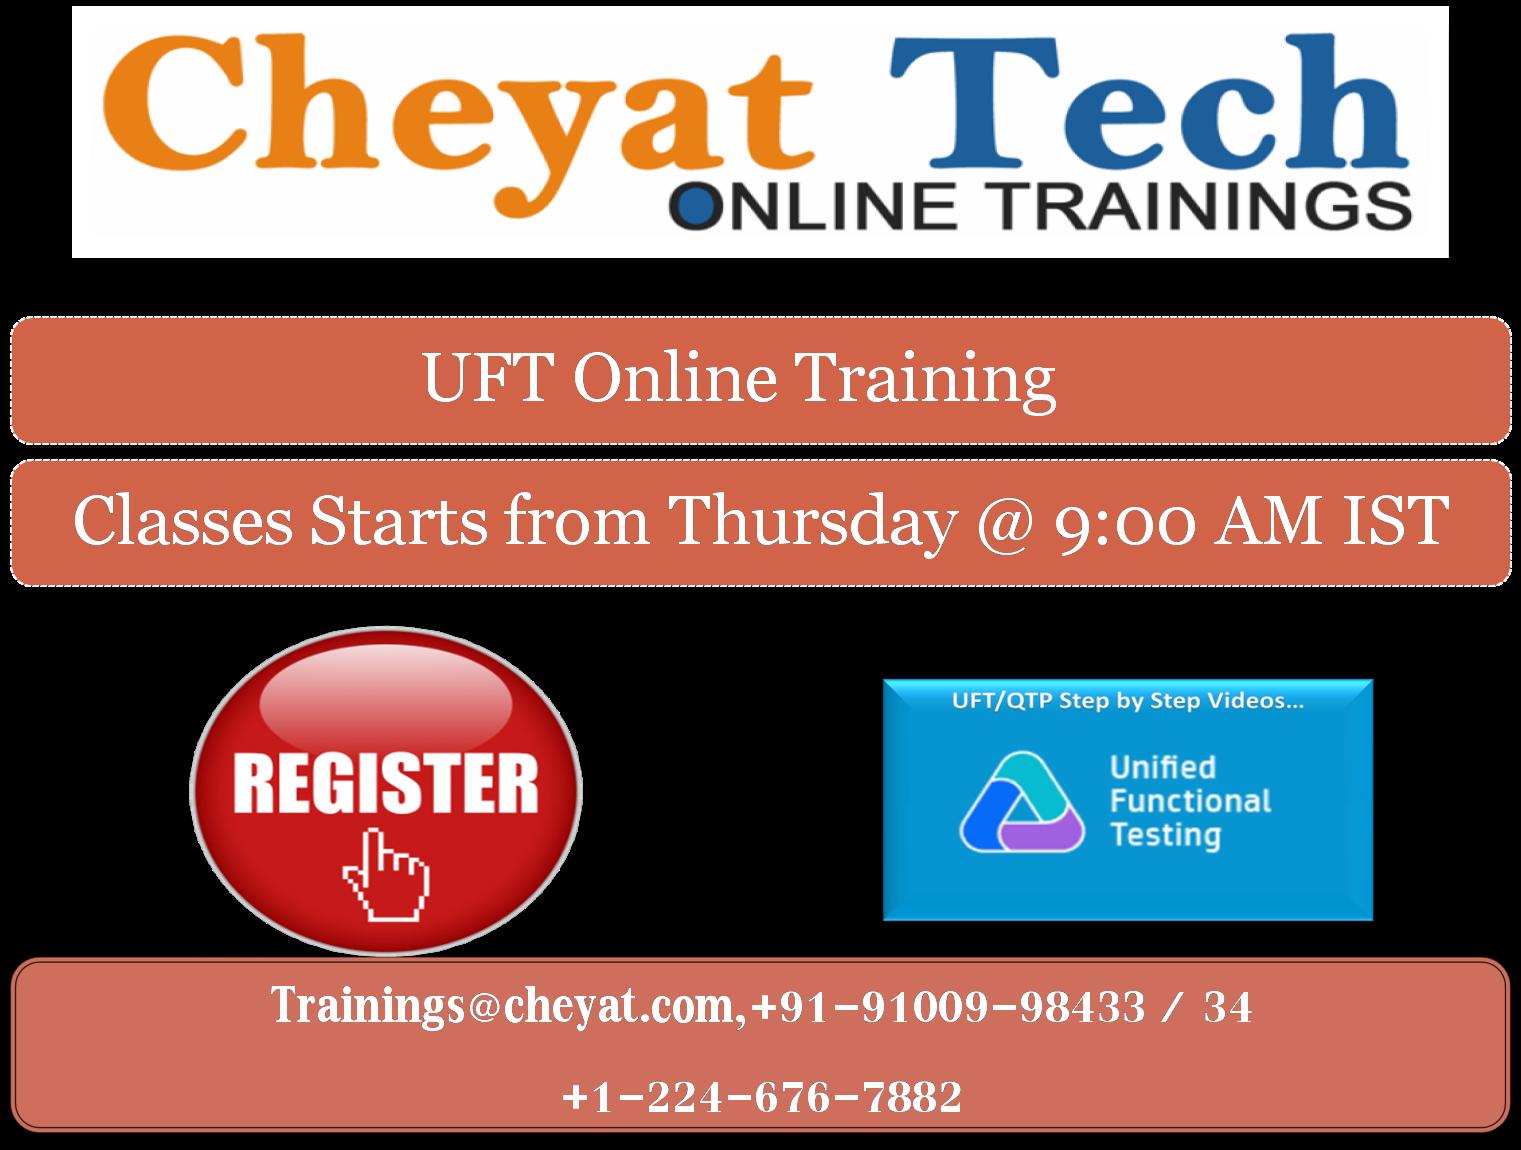 UFT Online Training   Cheyat Tech   QTP Online Training